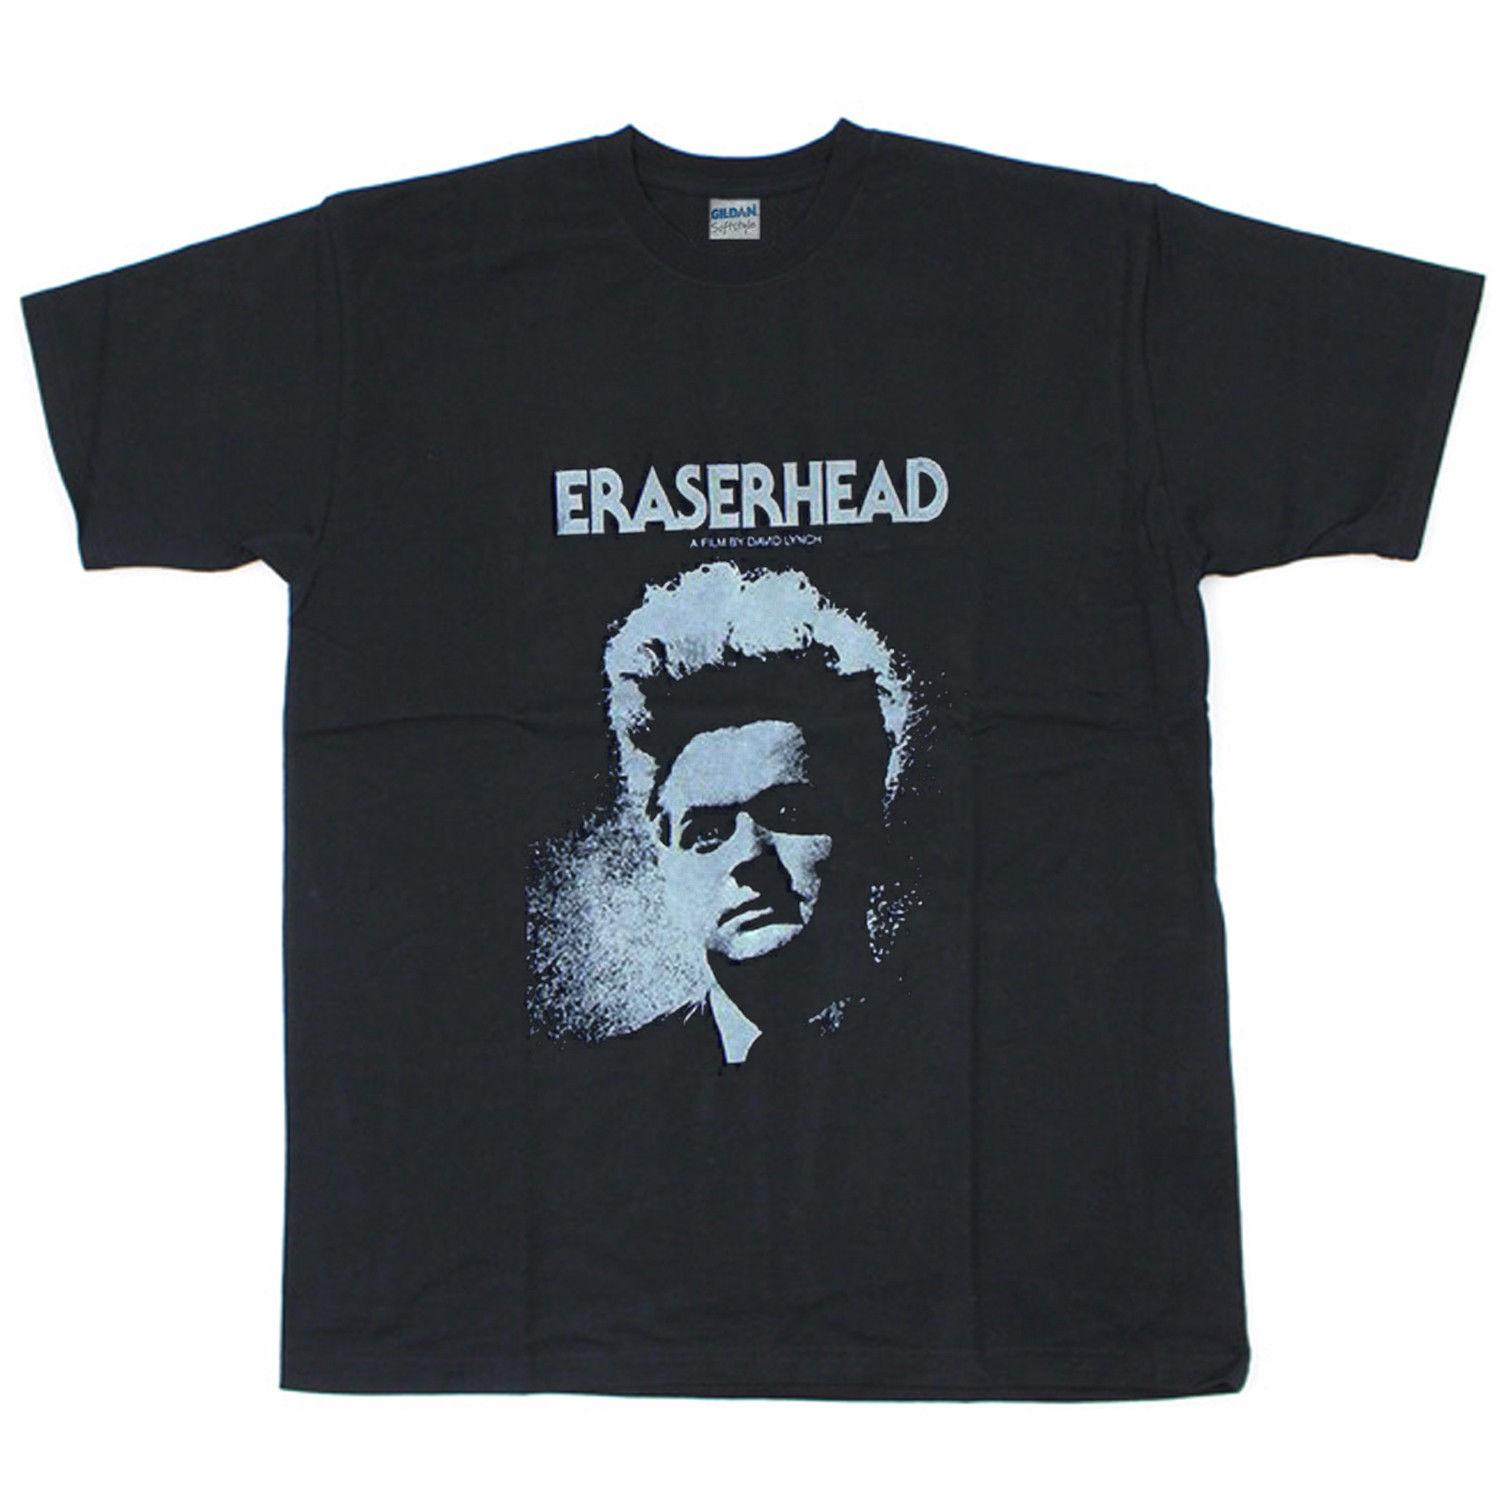 Vintage T-Shirt Eraserhead Baseball Jersey Tee David Lynch Twin Peaks Reprint Short Sleeve Fashion Summer Printing Casual